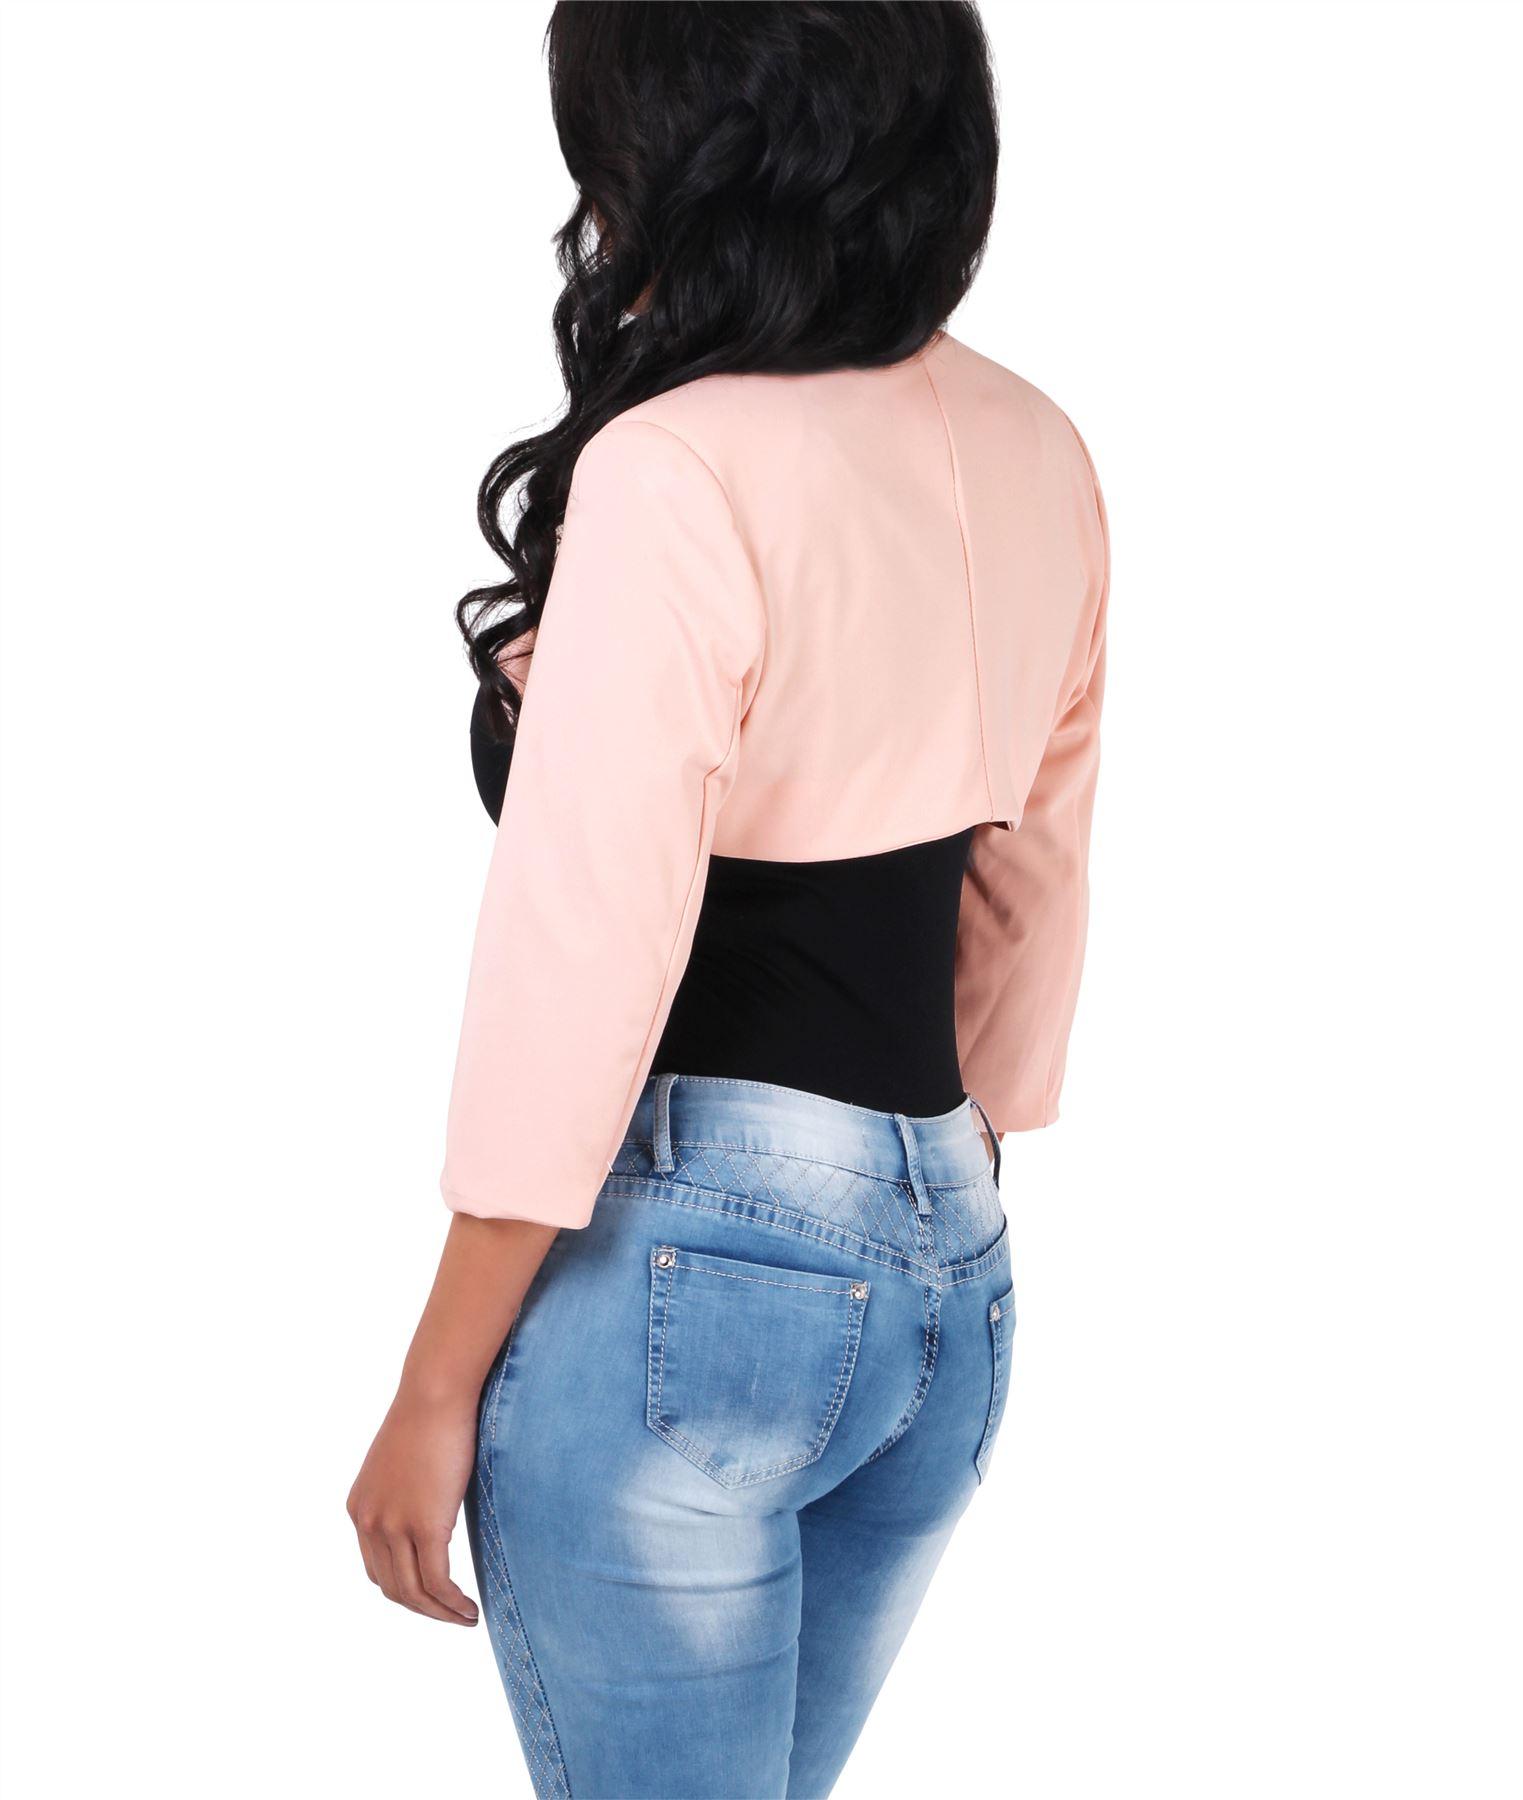 Womens-Tailored-Bolero-Shrug-Cropped-Top-Short-Sleeve-Party-Blazer-Jacket-Coat thumbnail 11